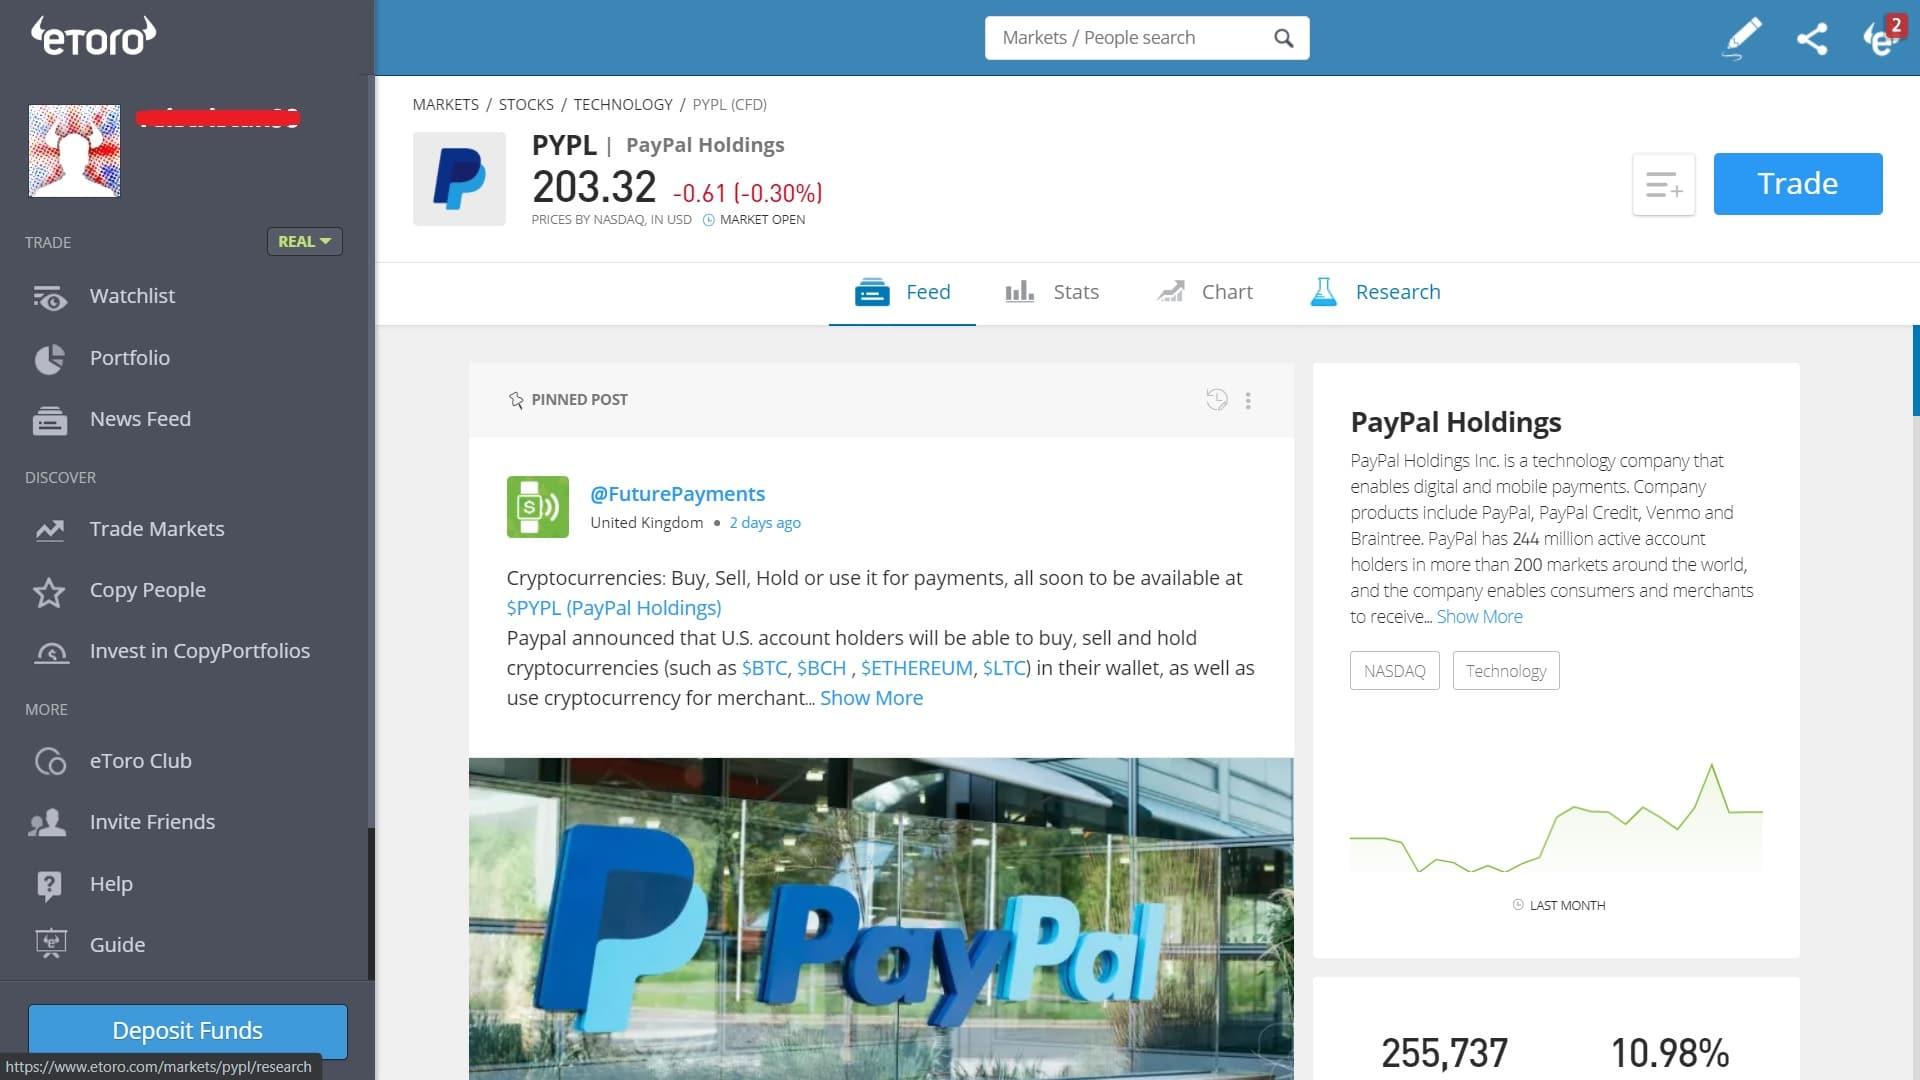 PayPal stock trading on eToro's platform